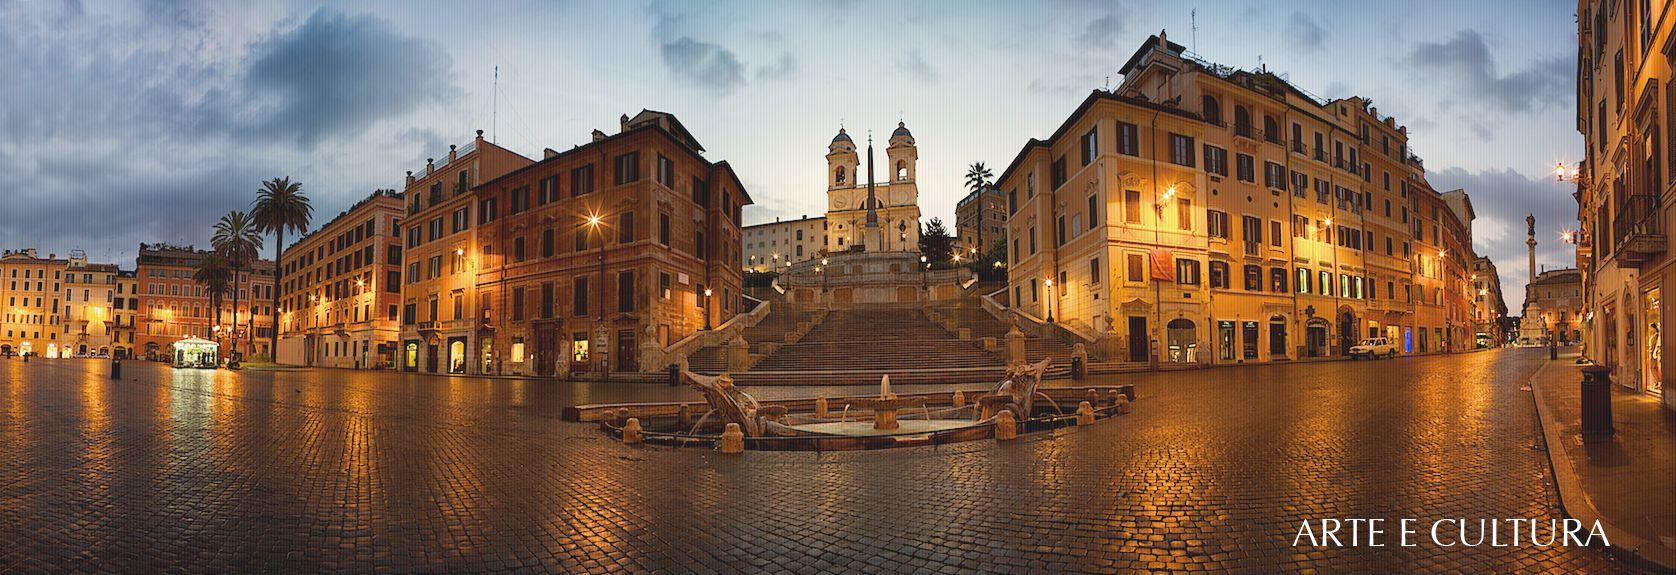 New Rhonas Tour Rome Piazza Di Spagna